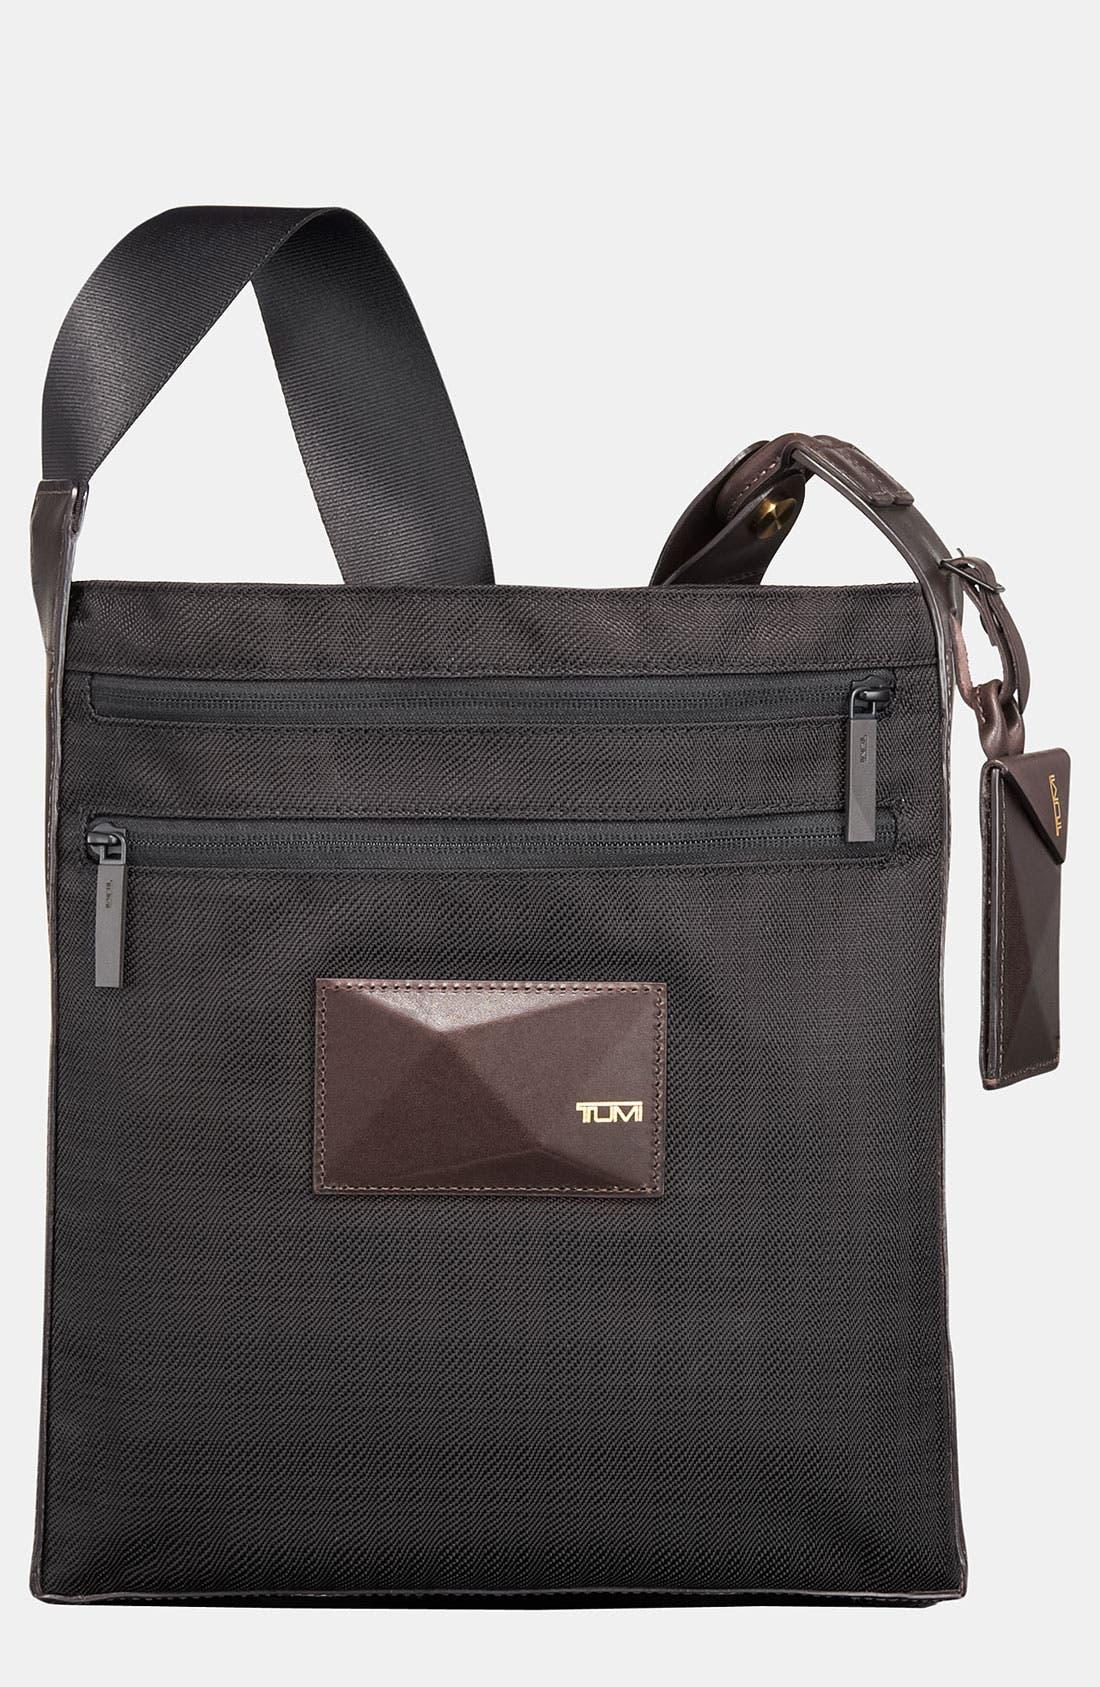 Alternate Image 1 Selected - Tumi 'Dror' Slim Crossbody Bag